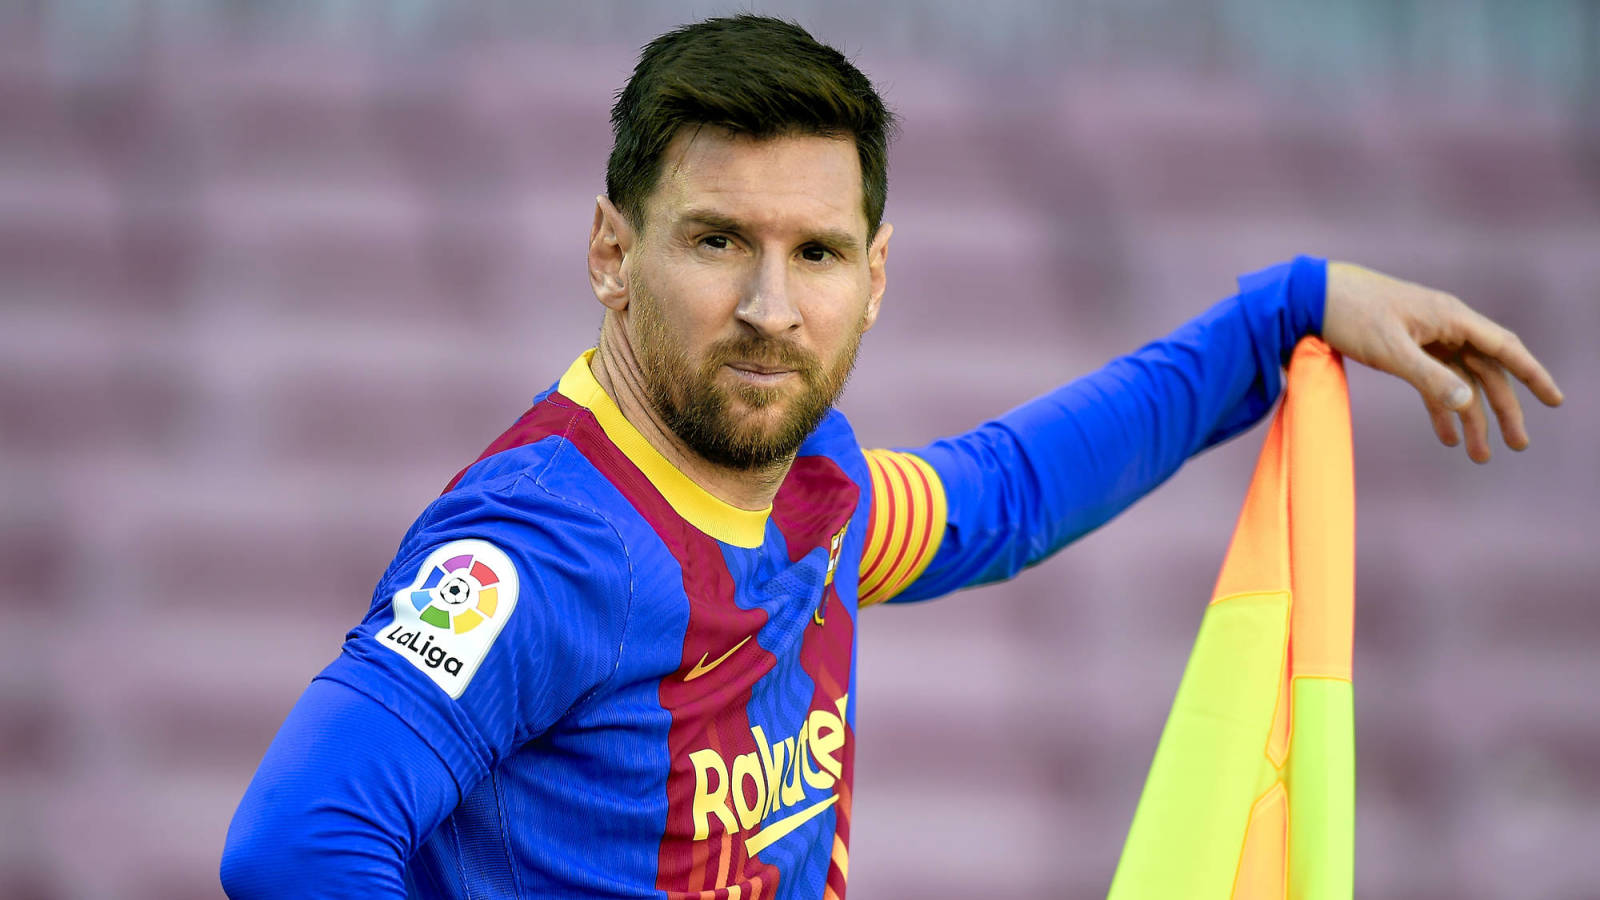 Will Lionel Messi sign with Paris Saint-Germain next week?